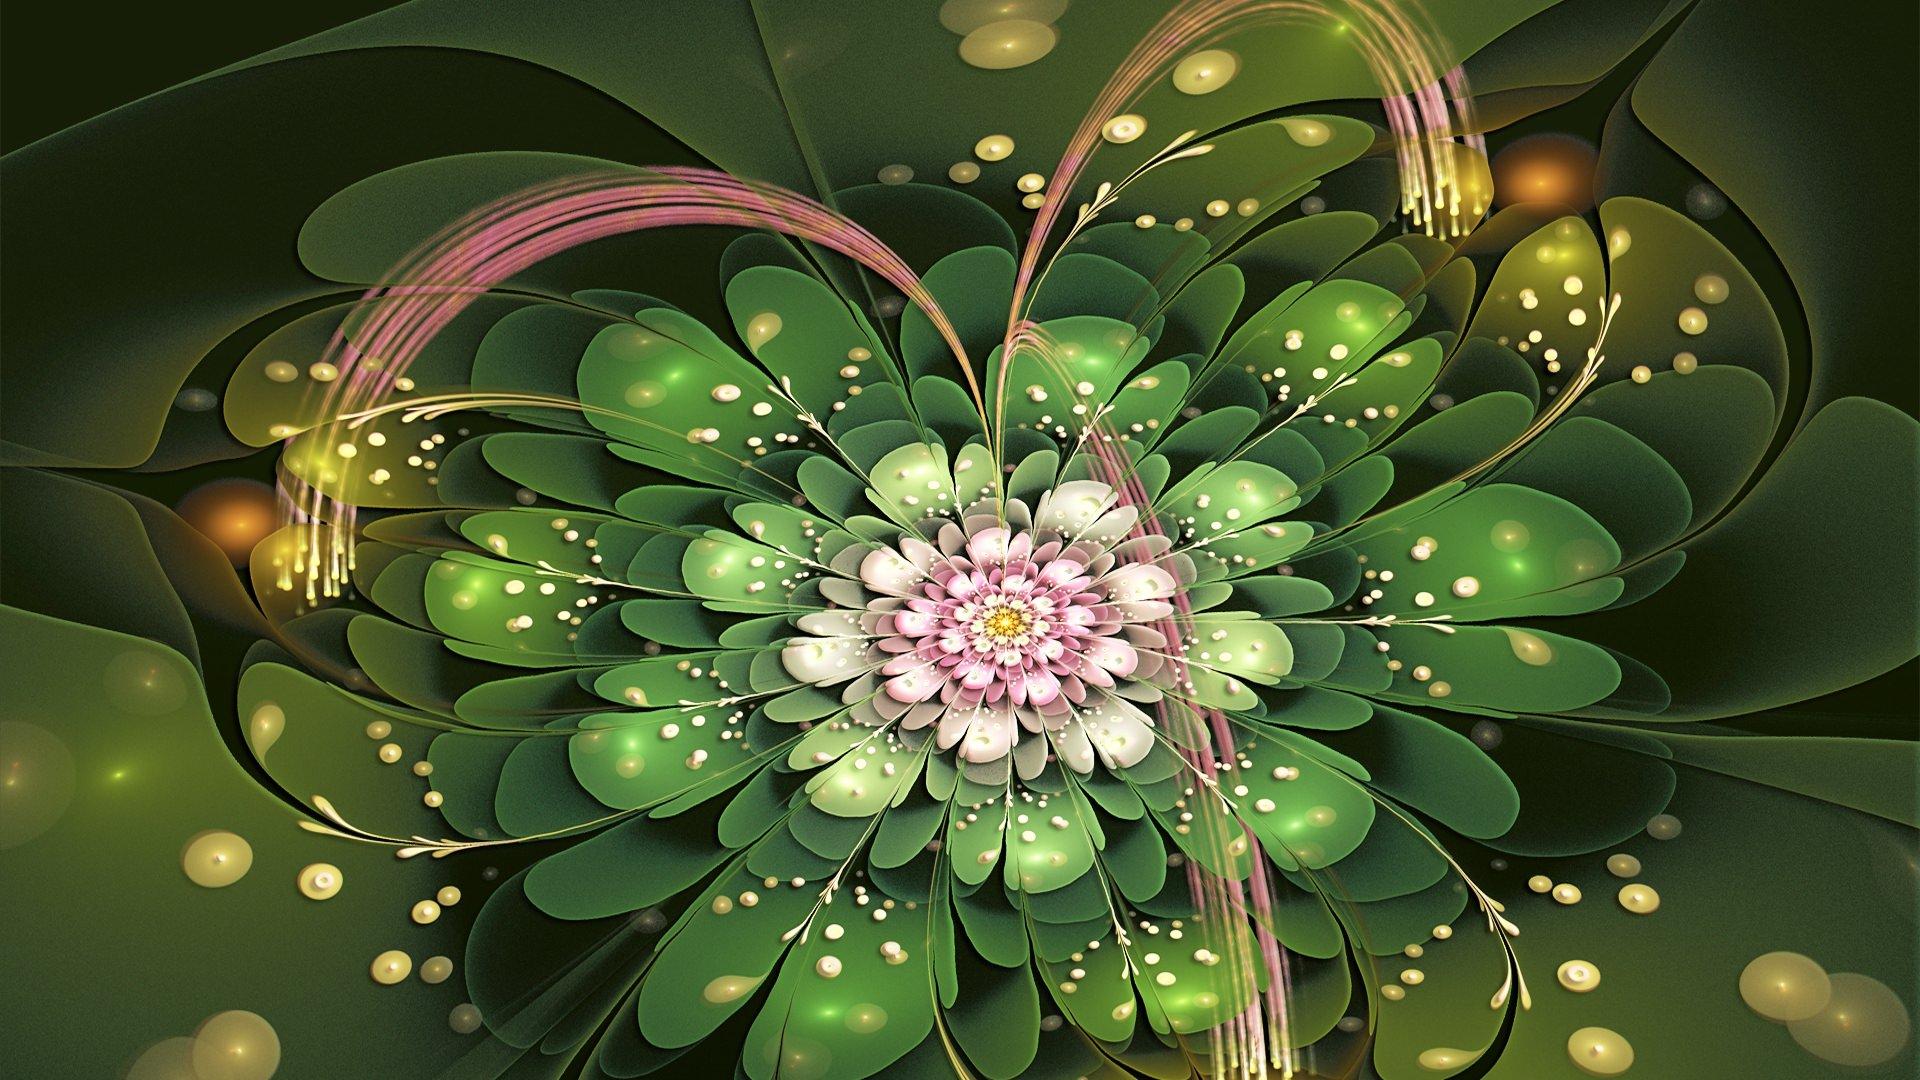 Fractal-Flower-Petals-Green-and-Pink-1920%C3%971080-wallpaper-wp3605769